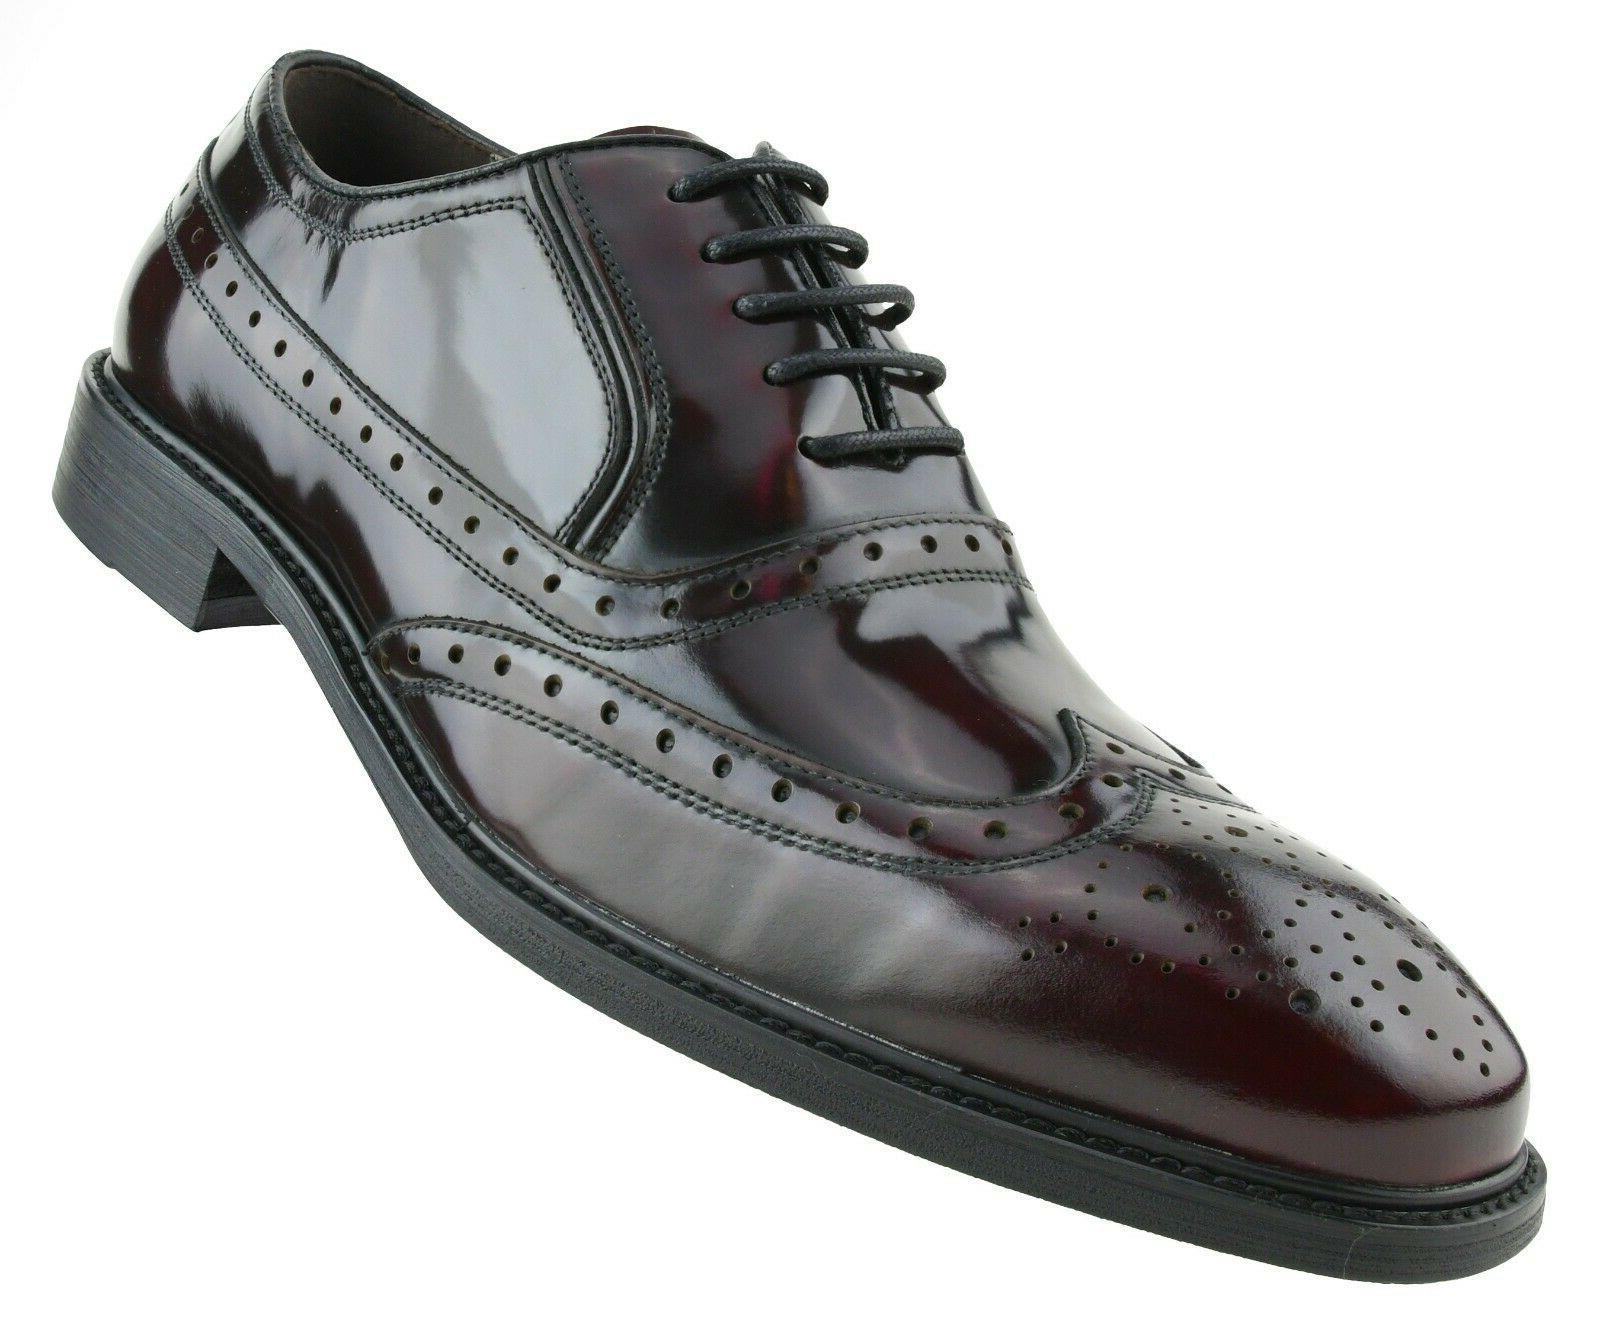 cc568da0c7765 Asher Green Mens Burgundy Genuine Box Calf Leather Wingtip Dress Shoe